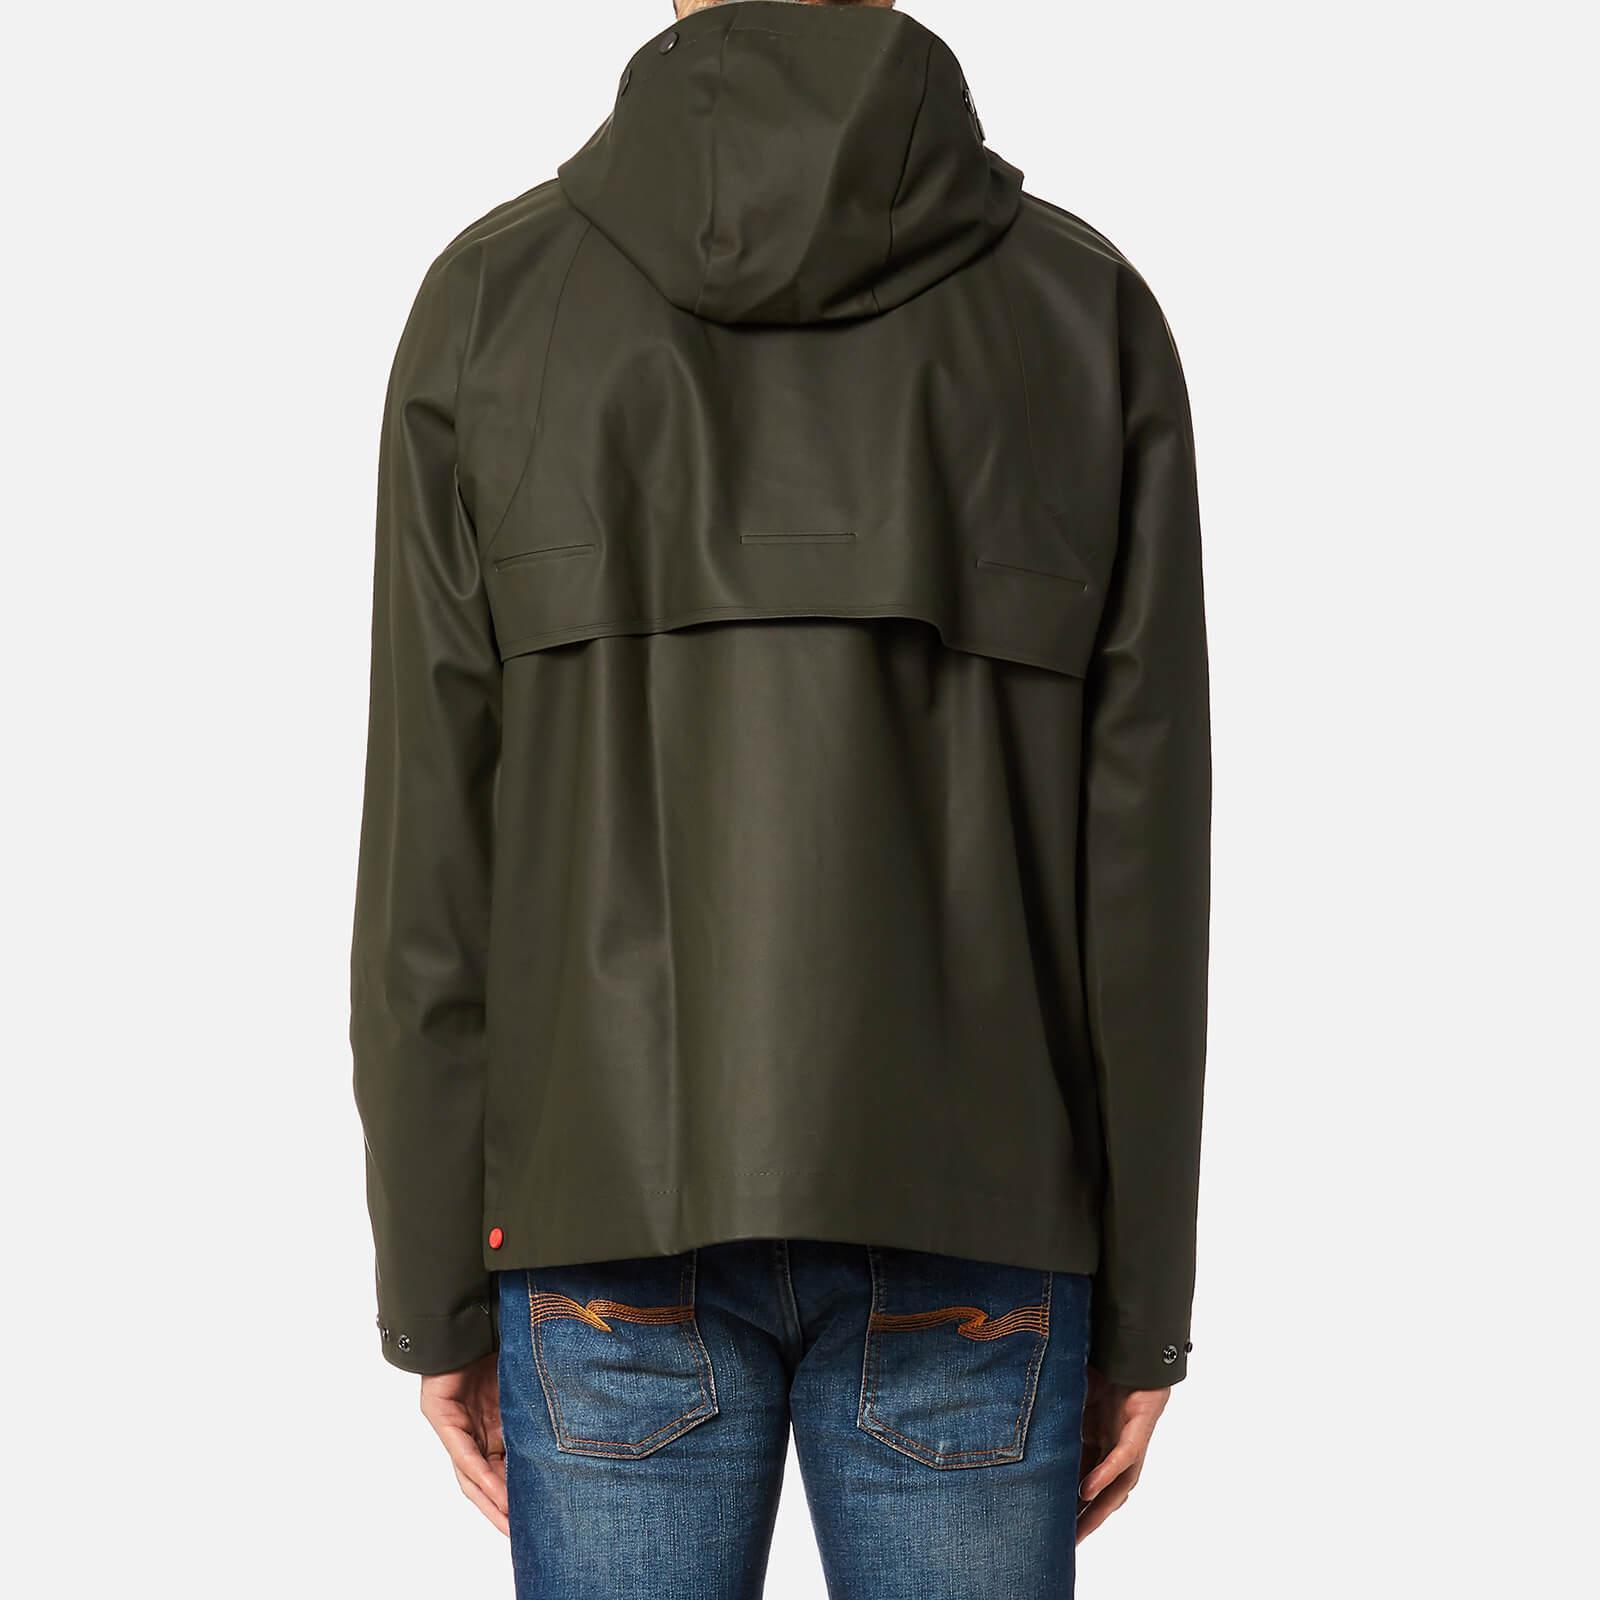 HUNTER Original Rubber Jacket in Green for Men